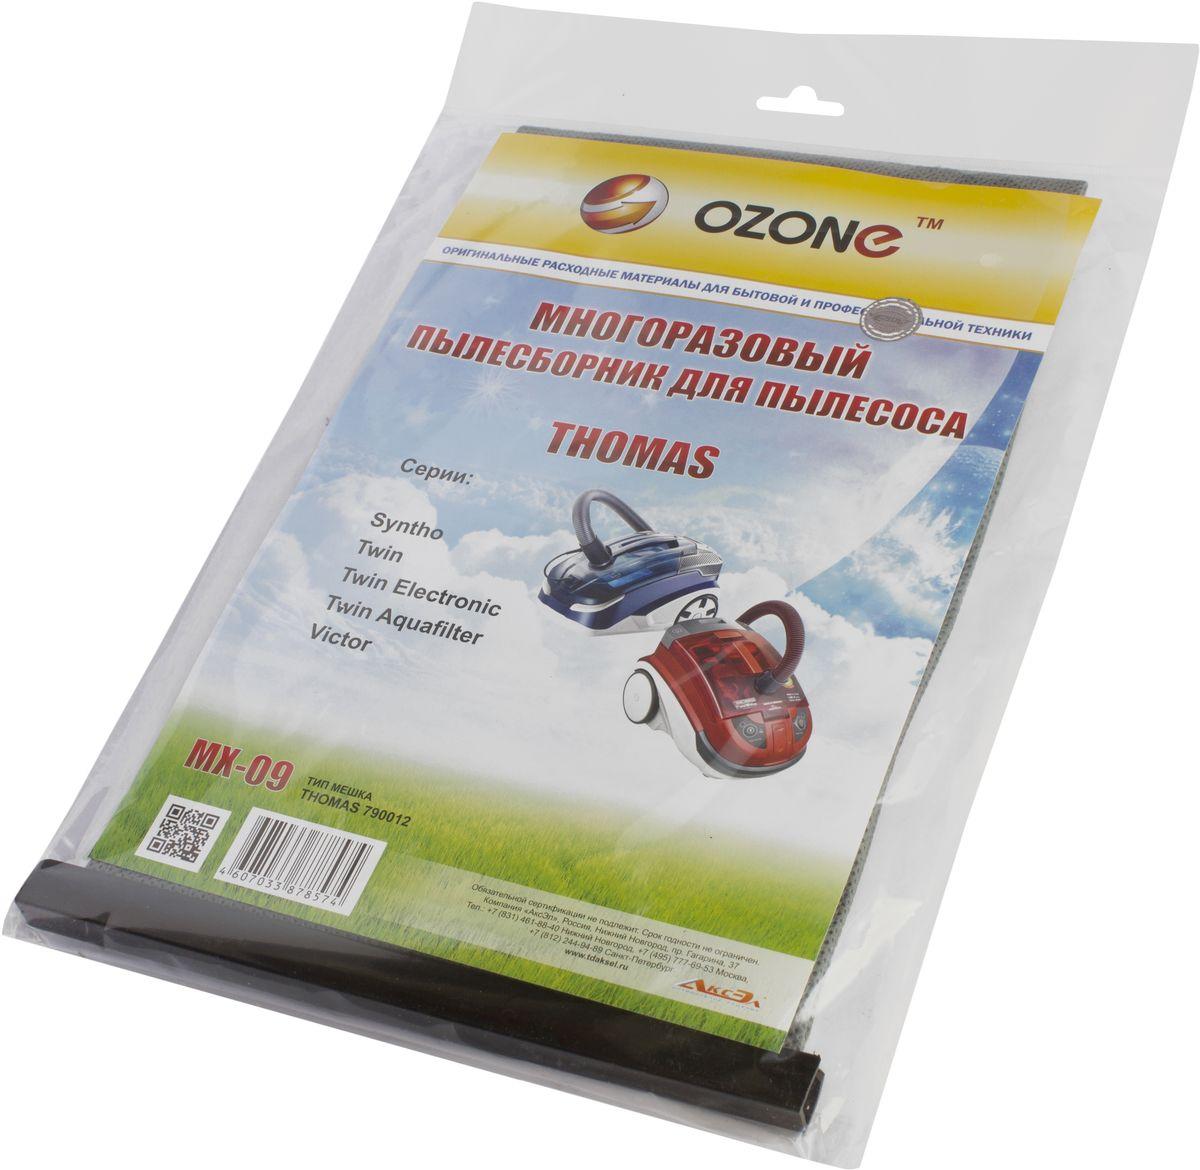 Ozone MX-09 пылесборник для пылесосов Thomas гриф кмс 1500 мм d 25 мм замок гайка вэйдера